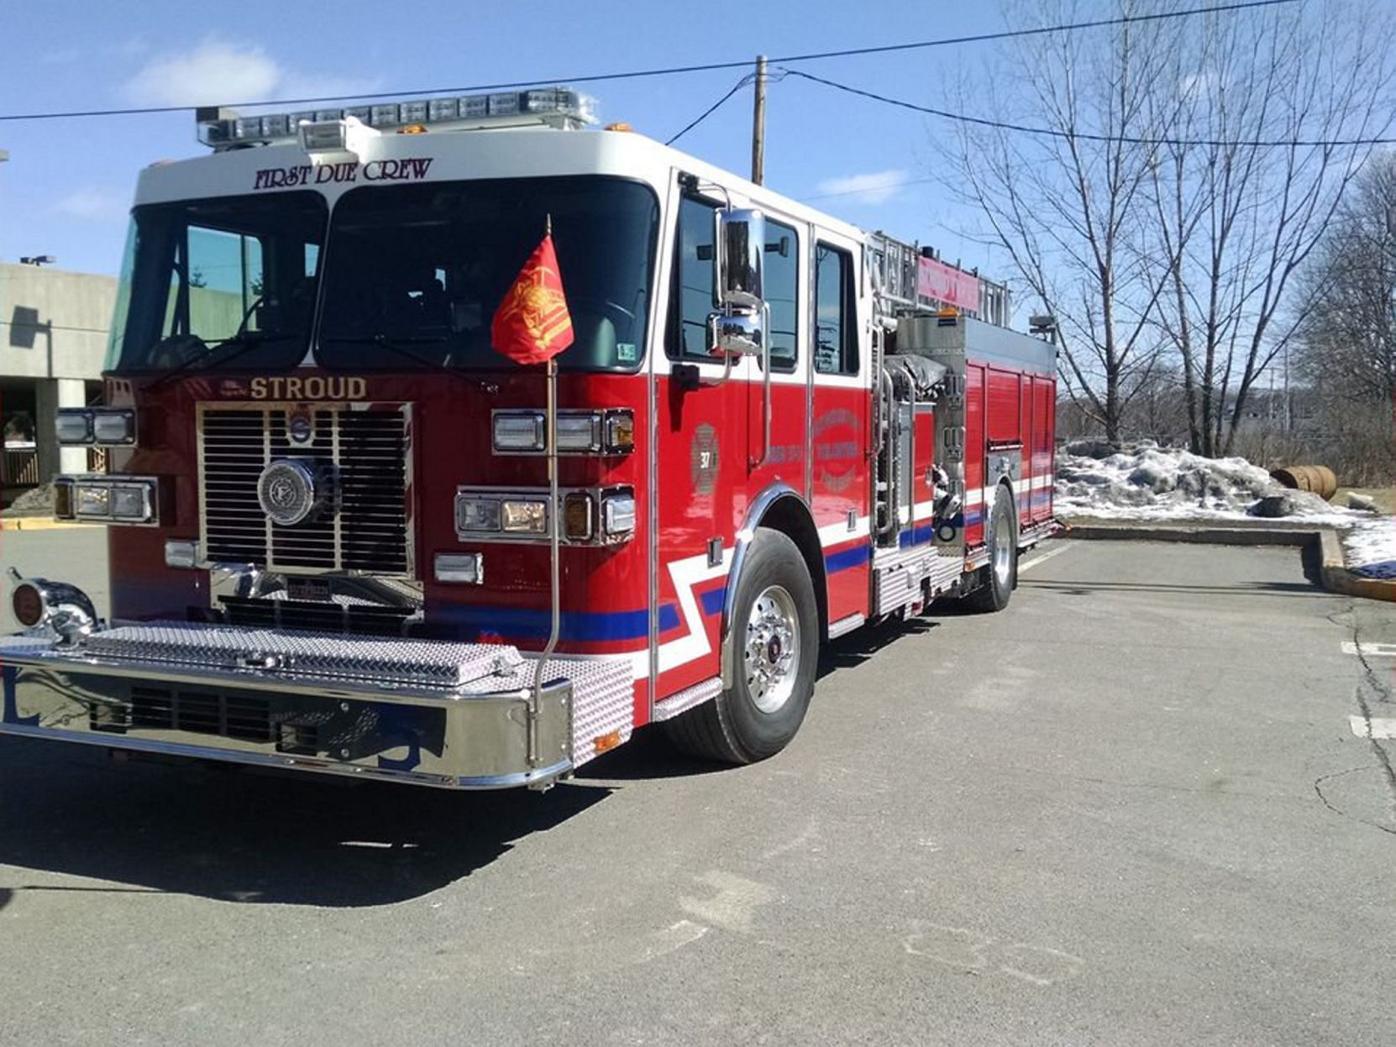 Fire under investigation at former Penn Hills Resort